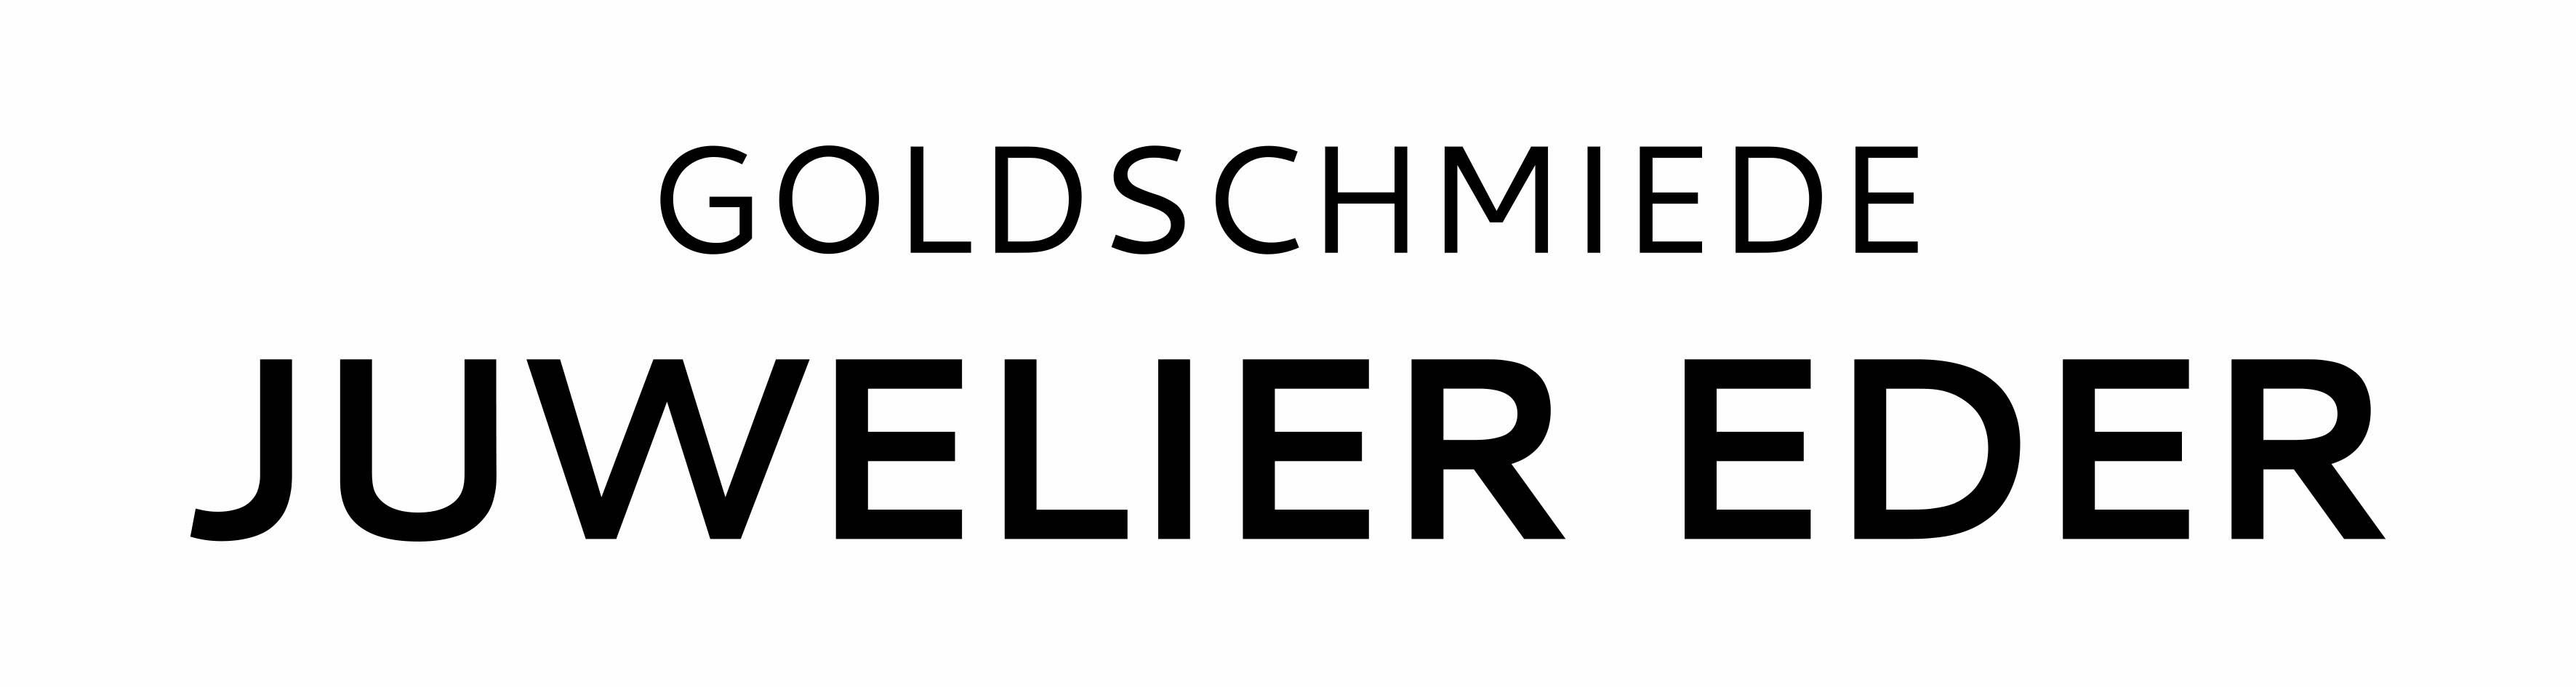 Eder-Juwelier-Marke-OK